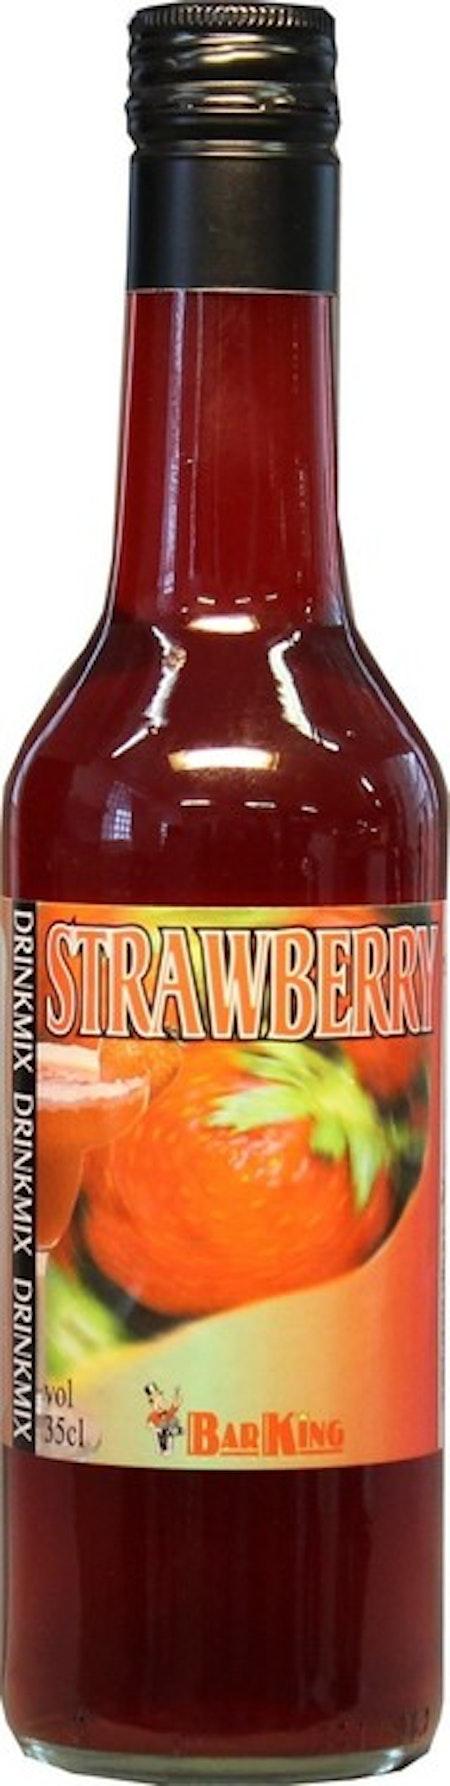 DRINKMIX / STRAWBERRY (JORDGUBBE) 35 CL